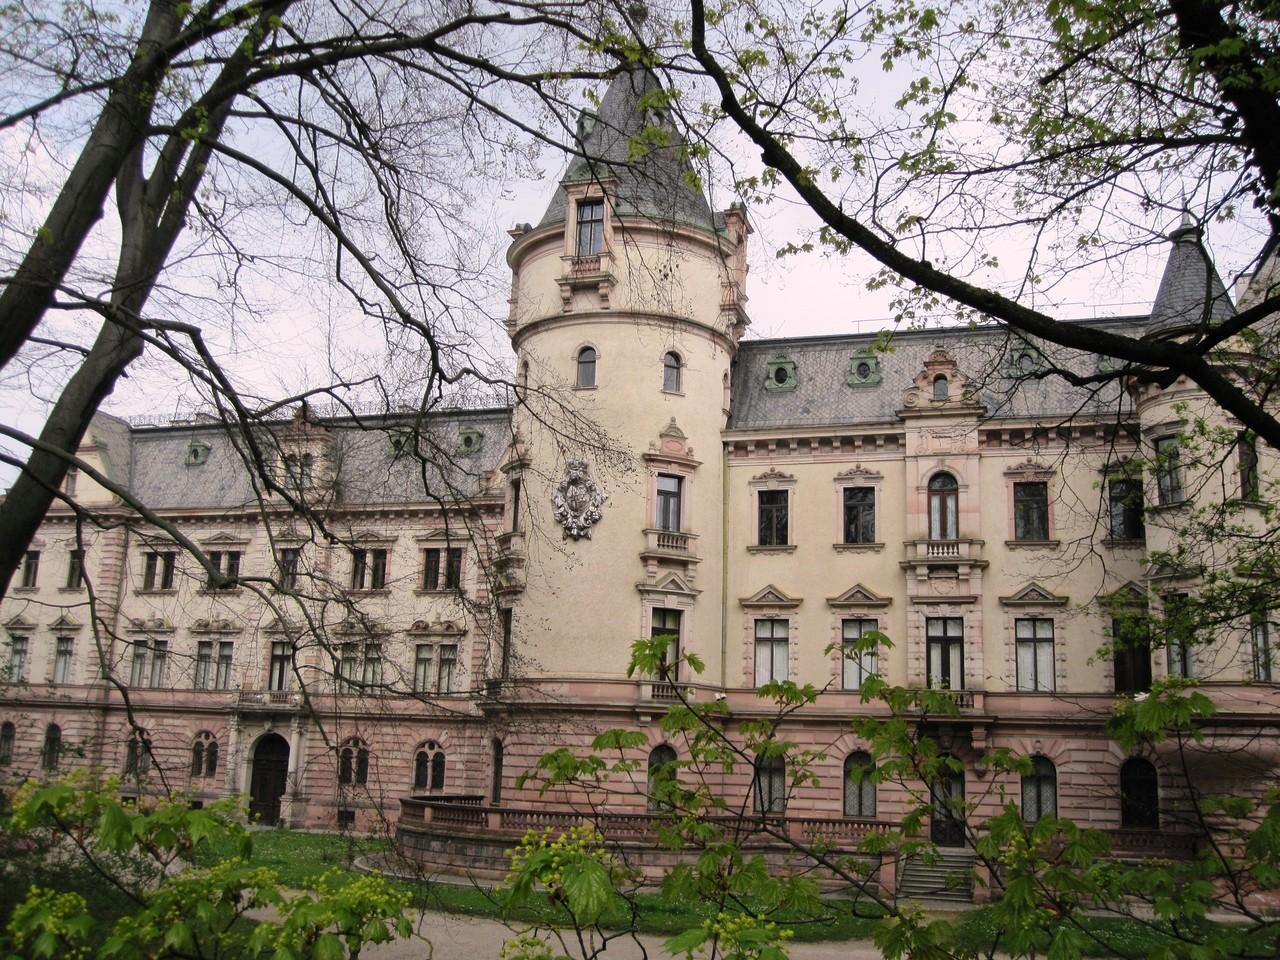 schloss milkendorf laidis regensburg